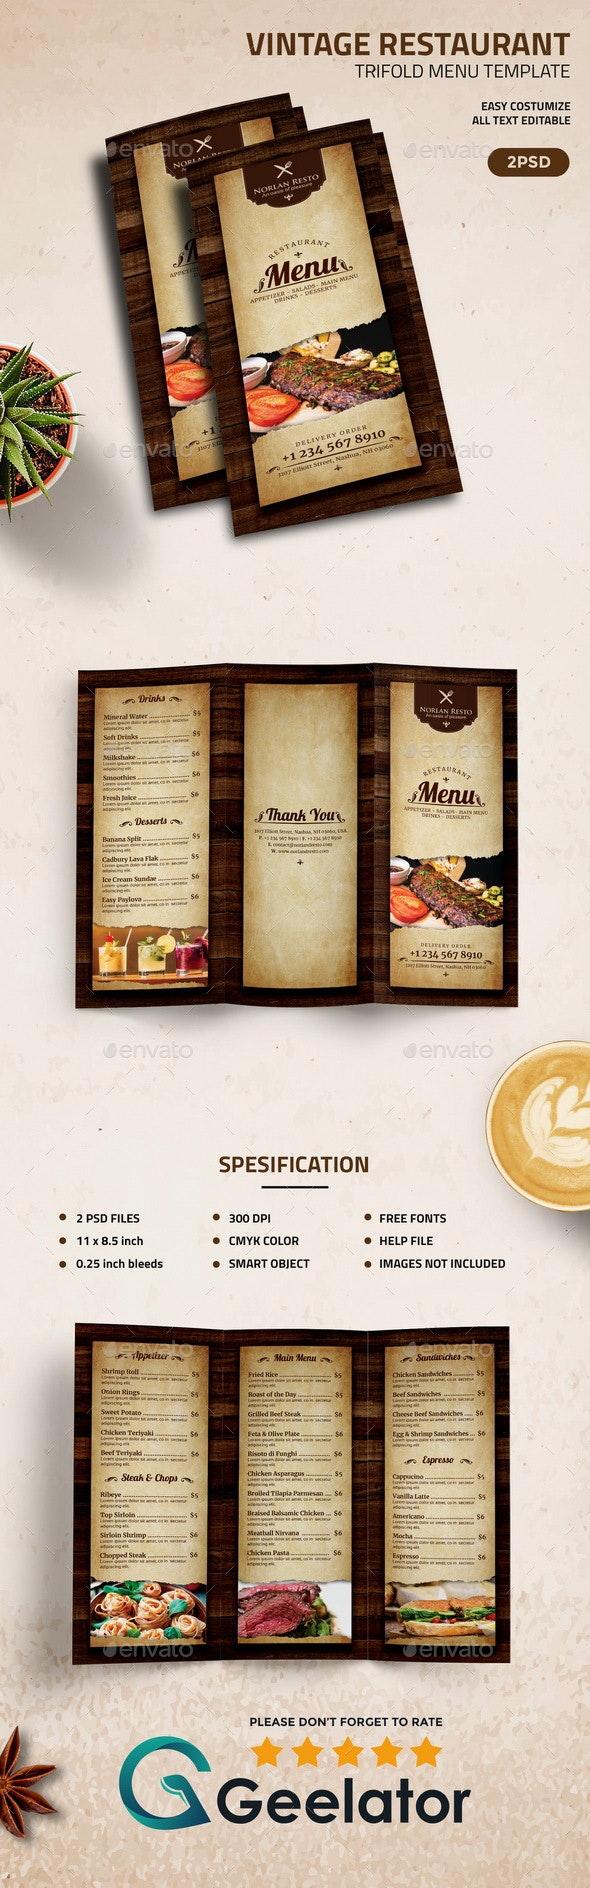 Vintage Restaurant  TriFold Menu Template - Food Menus Print Templates